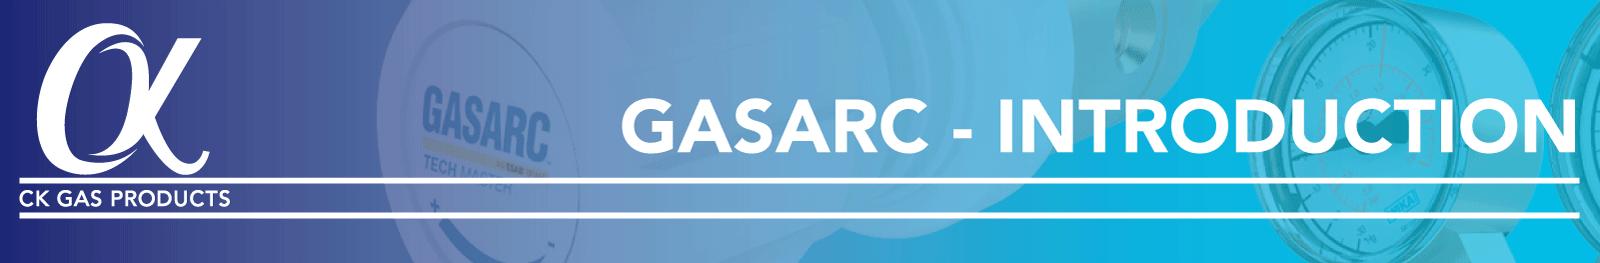 GASARC_BANNER-Introduction